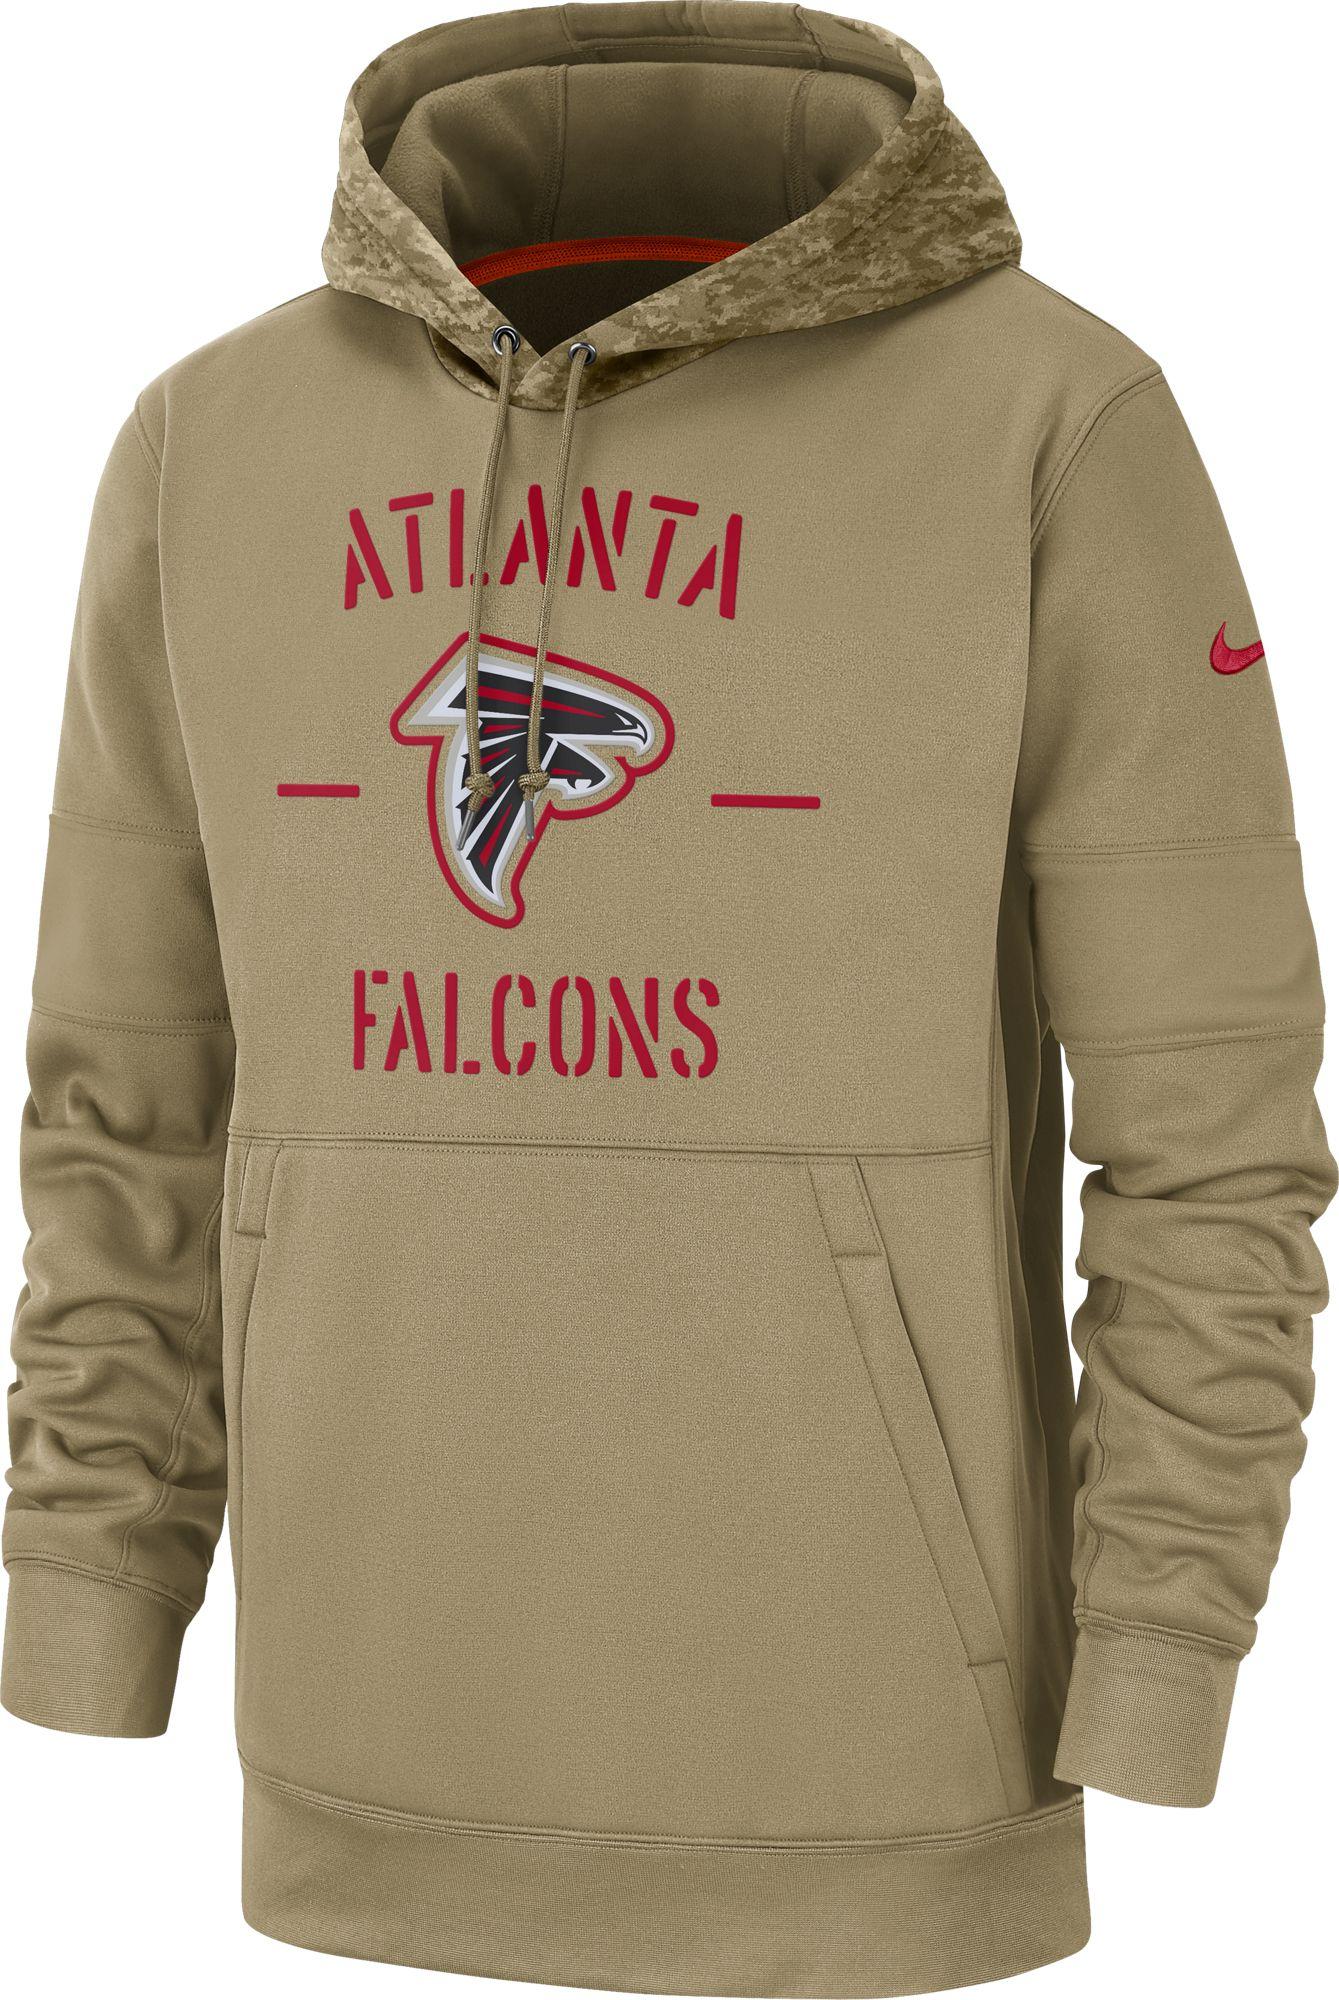 Atlanta Falcons Hoodies | Best Price